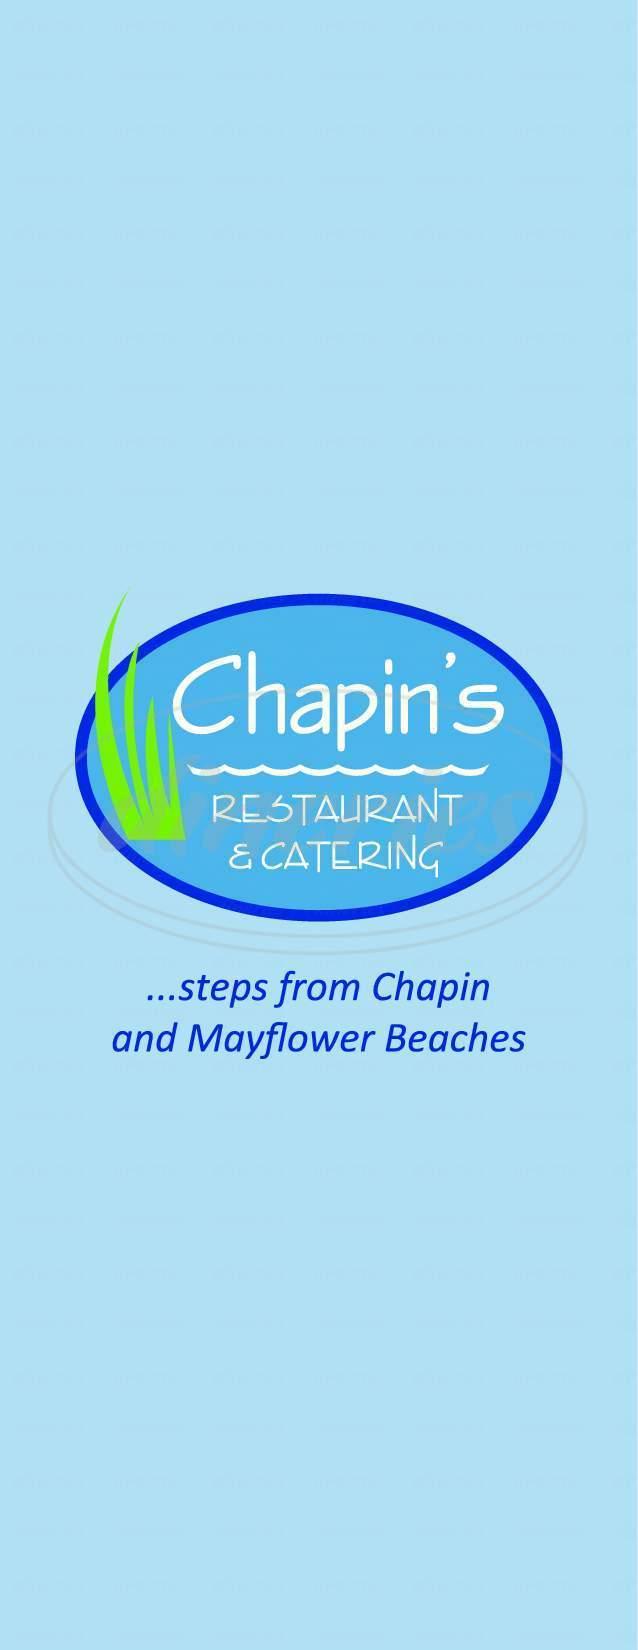 menu for Chapin's Restaurant